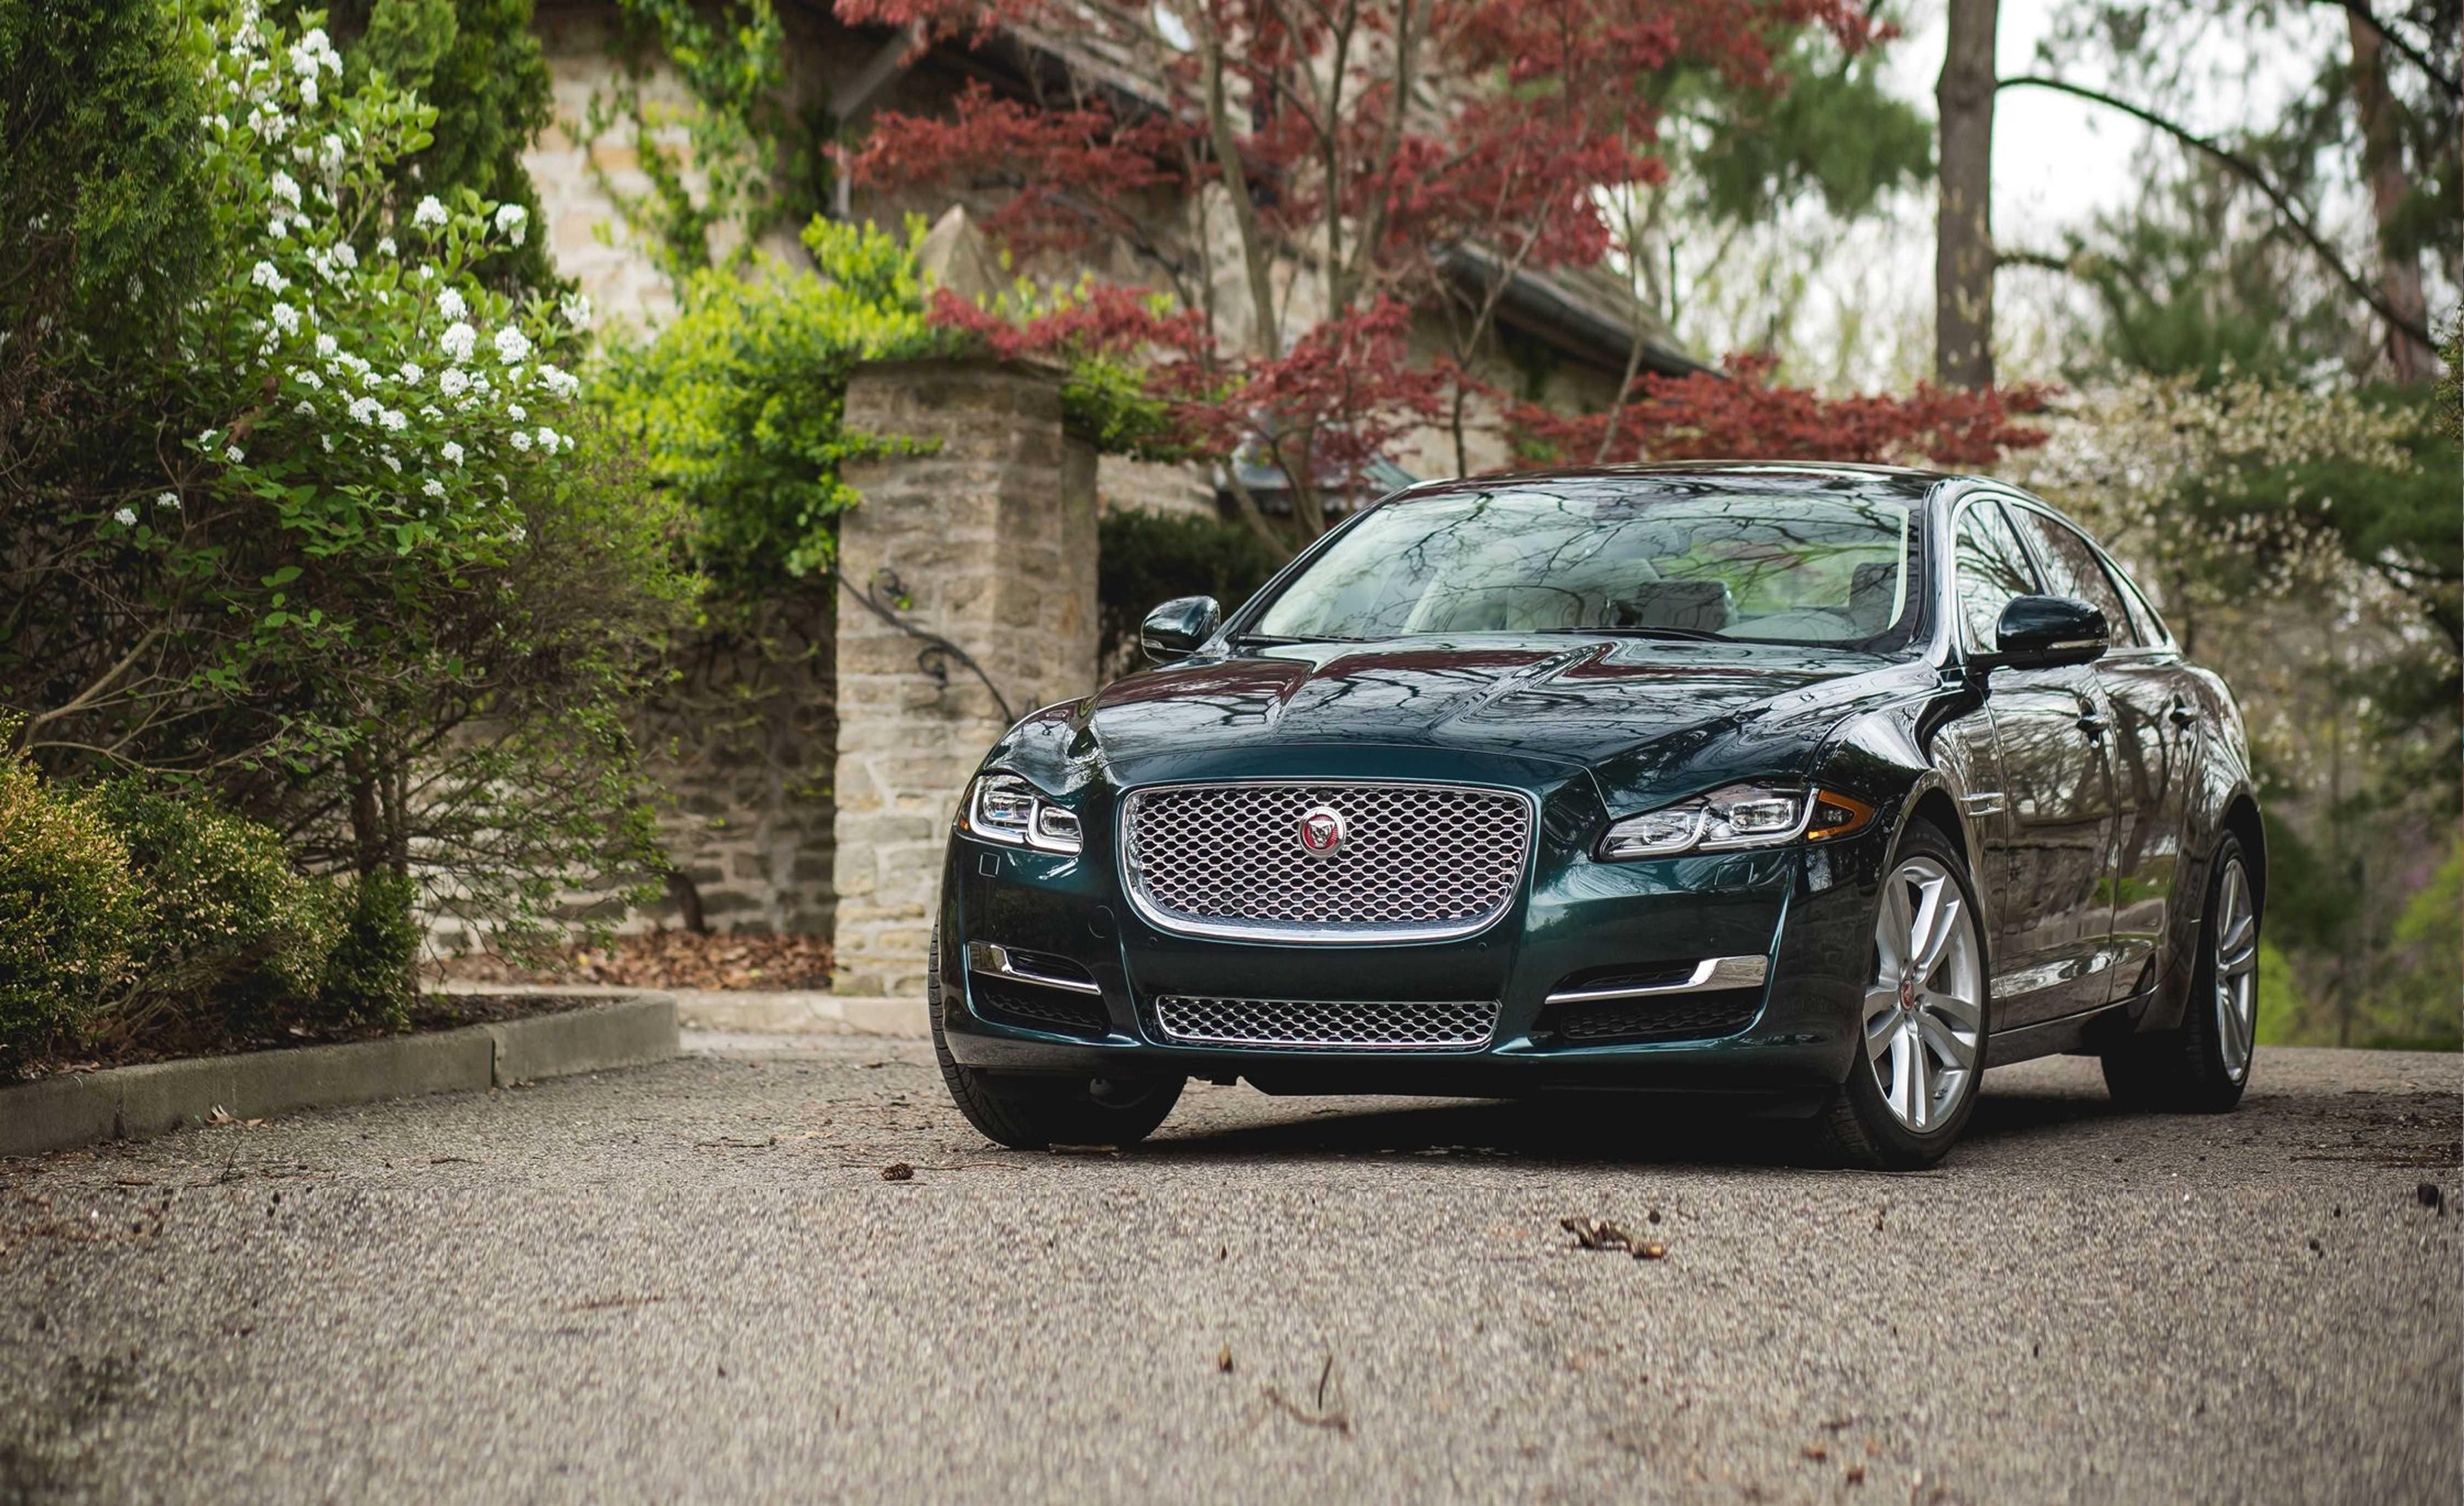 Jaguar xj swb 2.0t at premium luxury (05.2014 - 02.2016) - технические характеристики